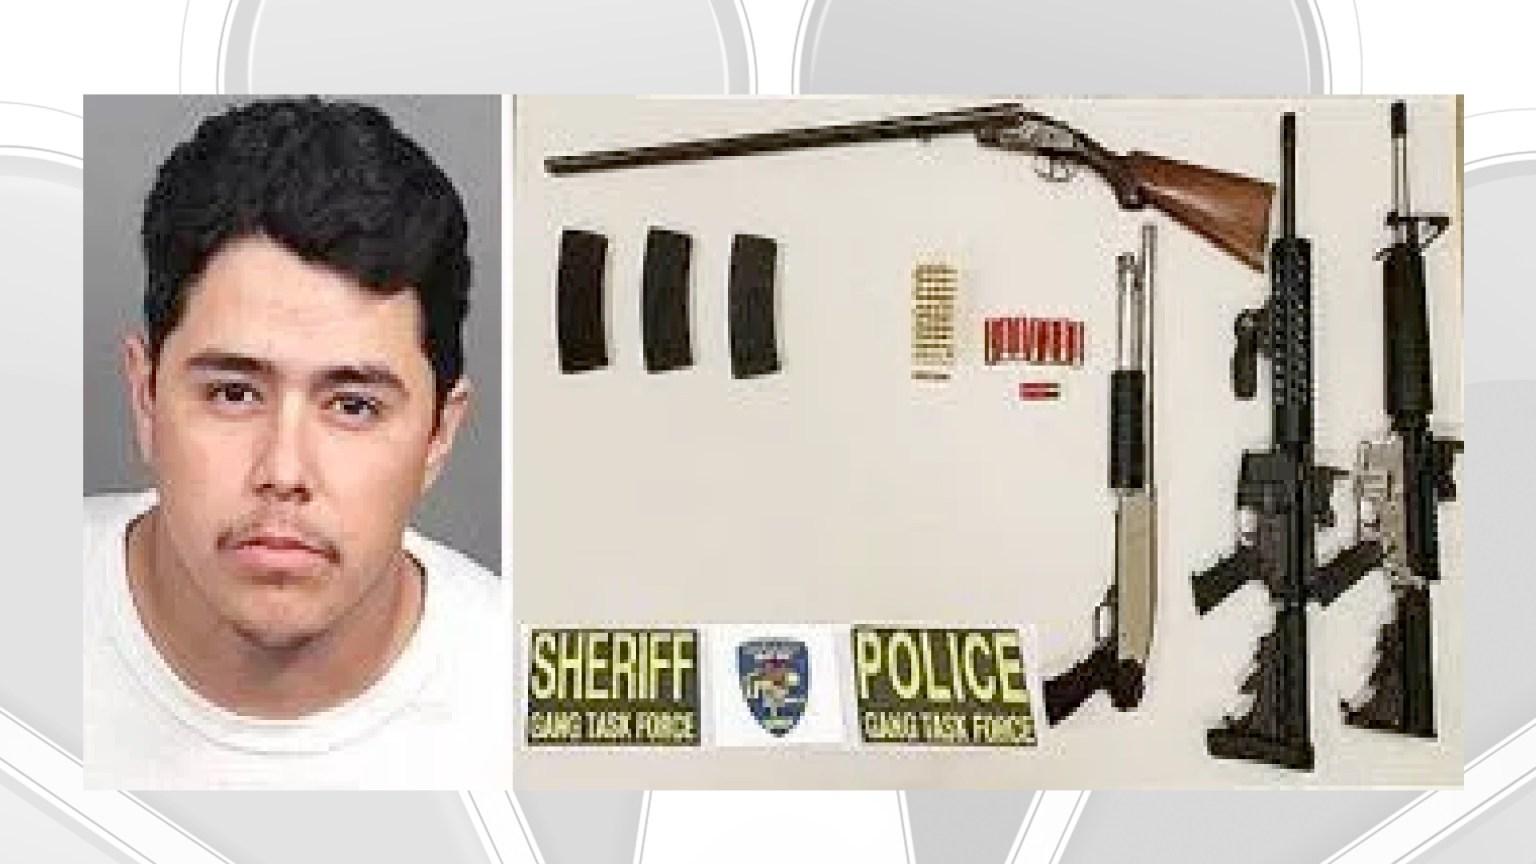 Gang Member Suspected Of Shooting At Two People Behind Bars